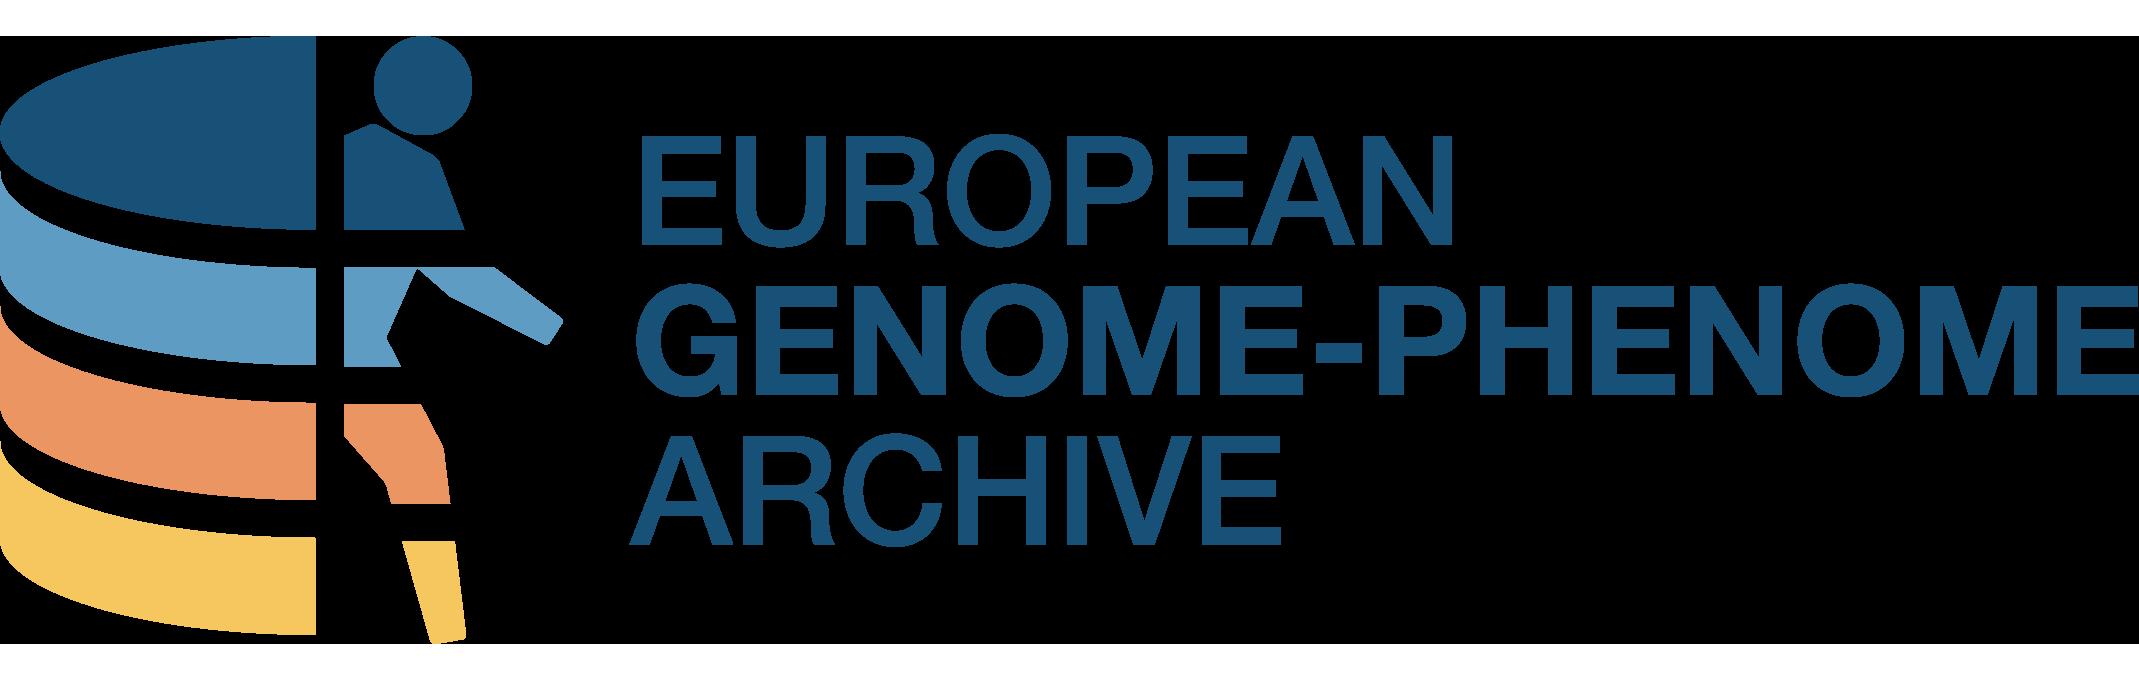 Genome-phenome